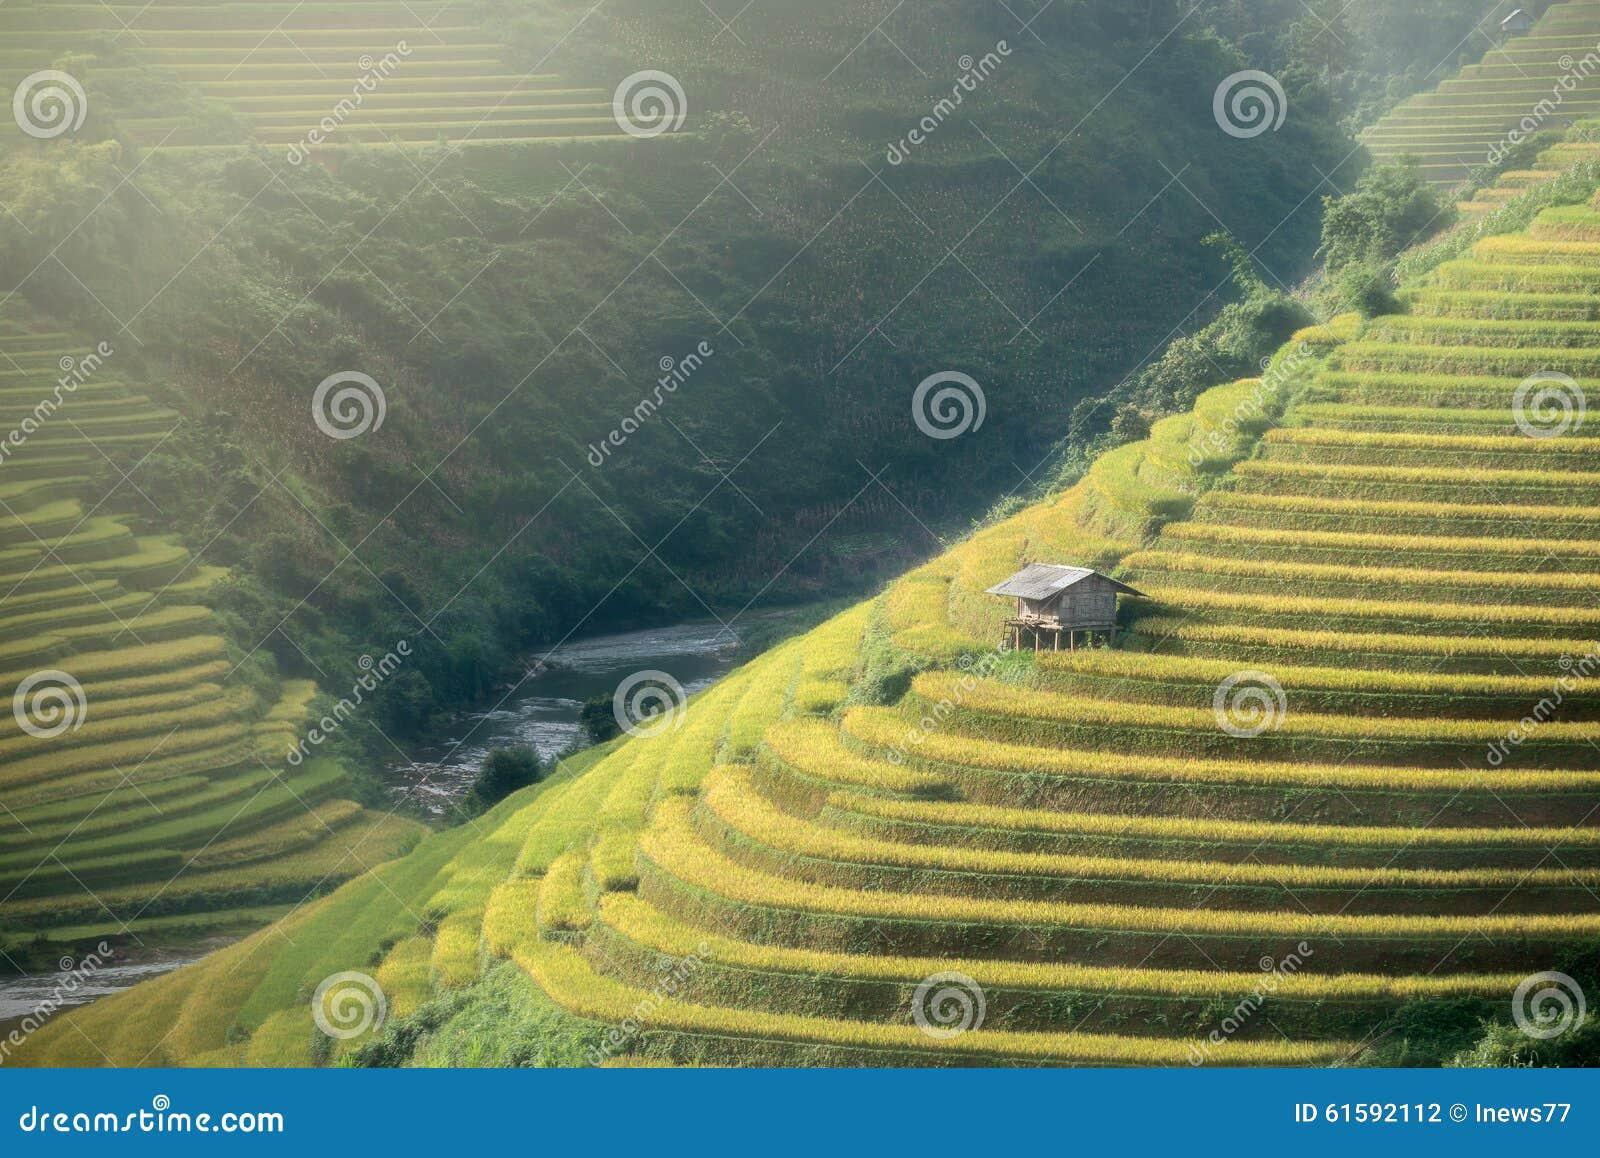 Le riz met en place sur en terrasse de la MU Cang Chai, YenBai, Vietnam Riz f